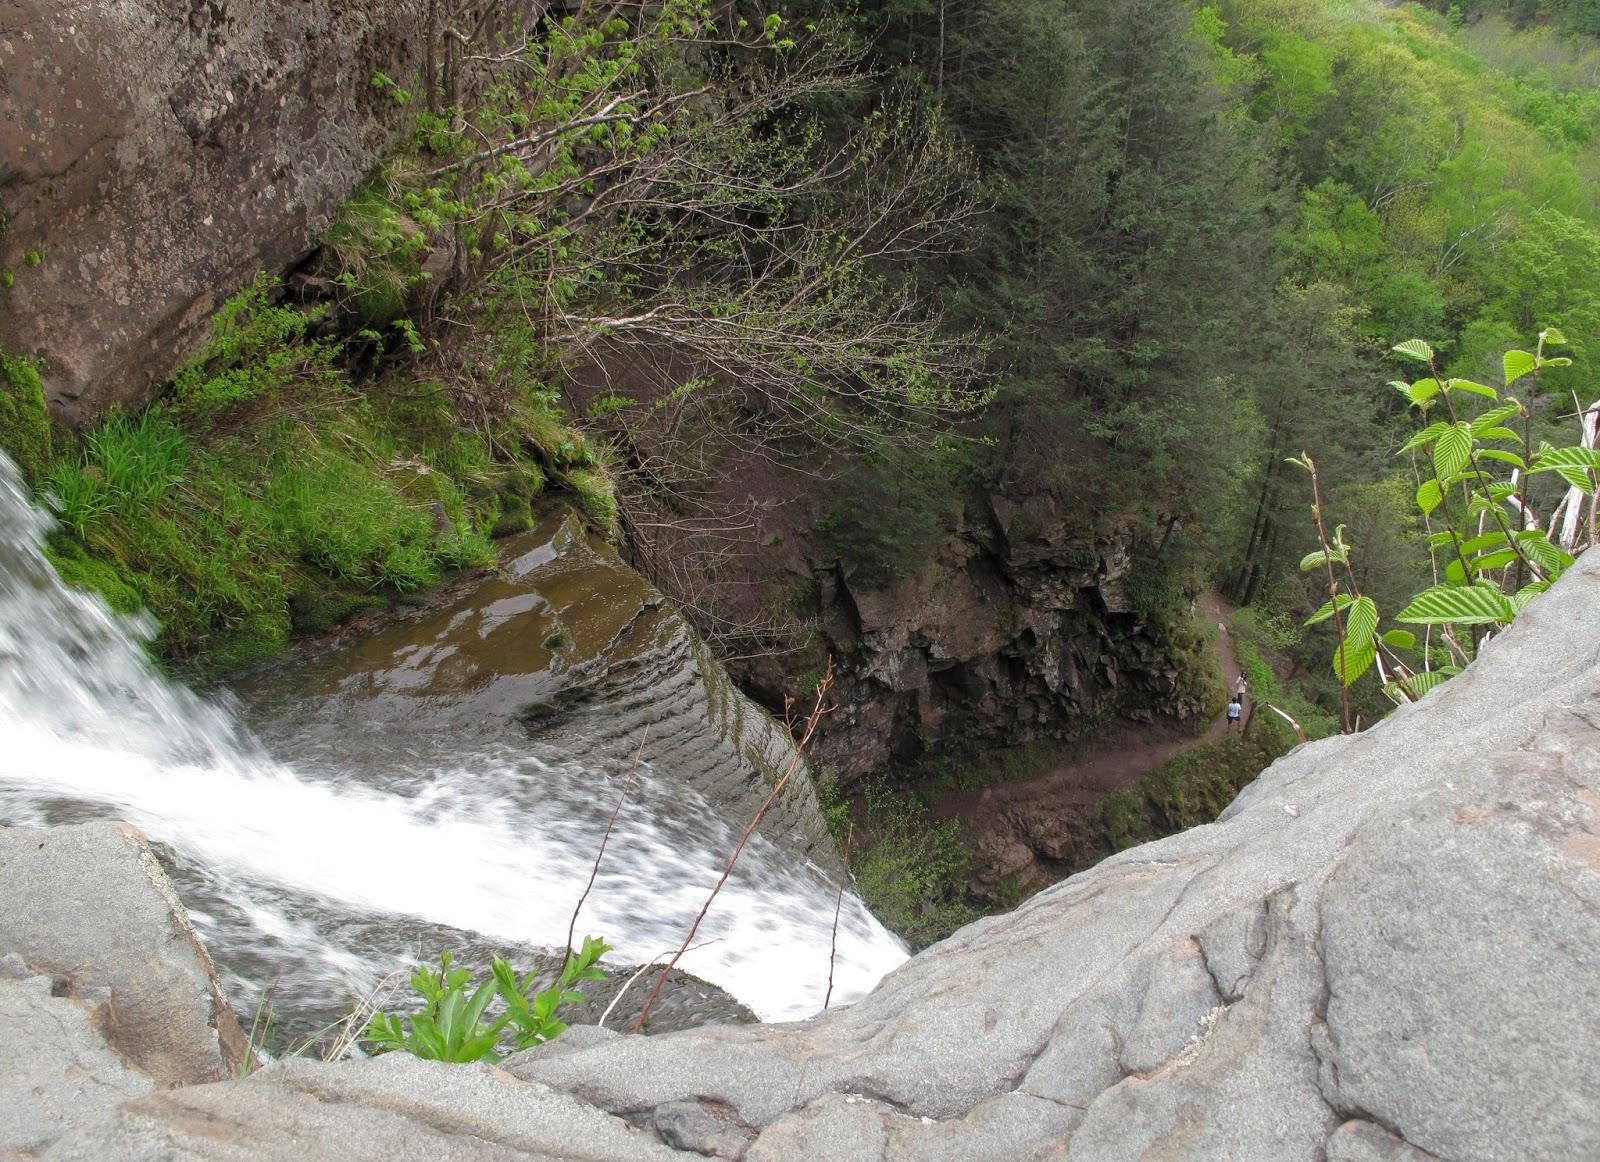 N.J. Woman Falls 100 Feet To Her Death While Hiking — Same